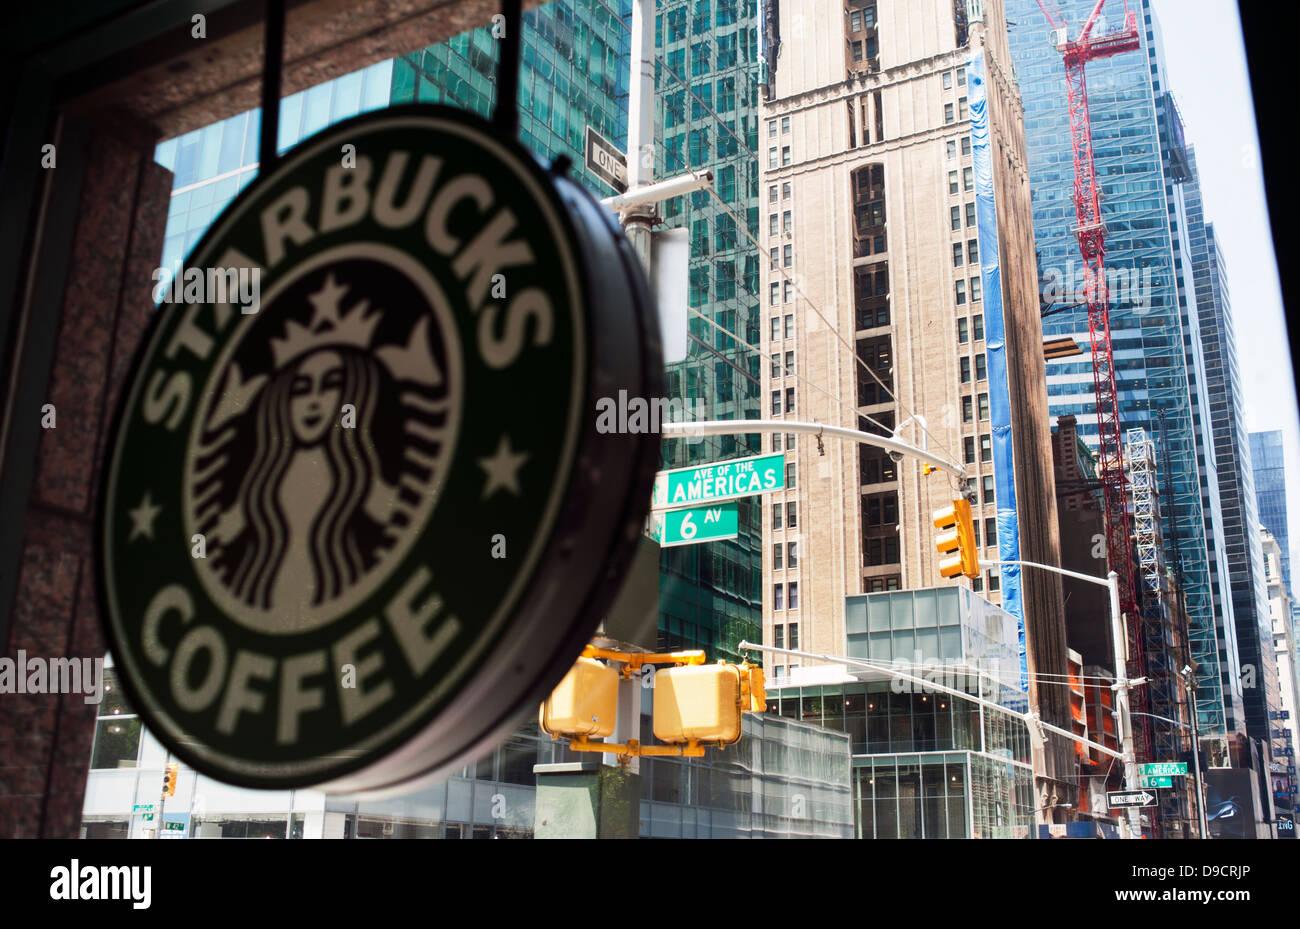 Starbucks on 'the Avenue of the Americas' New York City - Stock Image